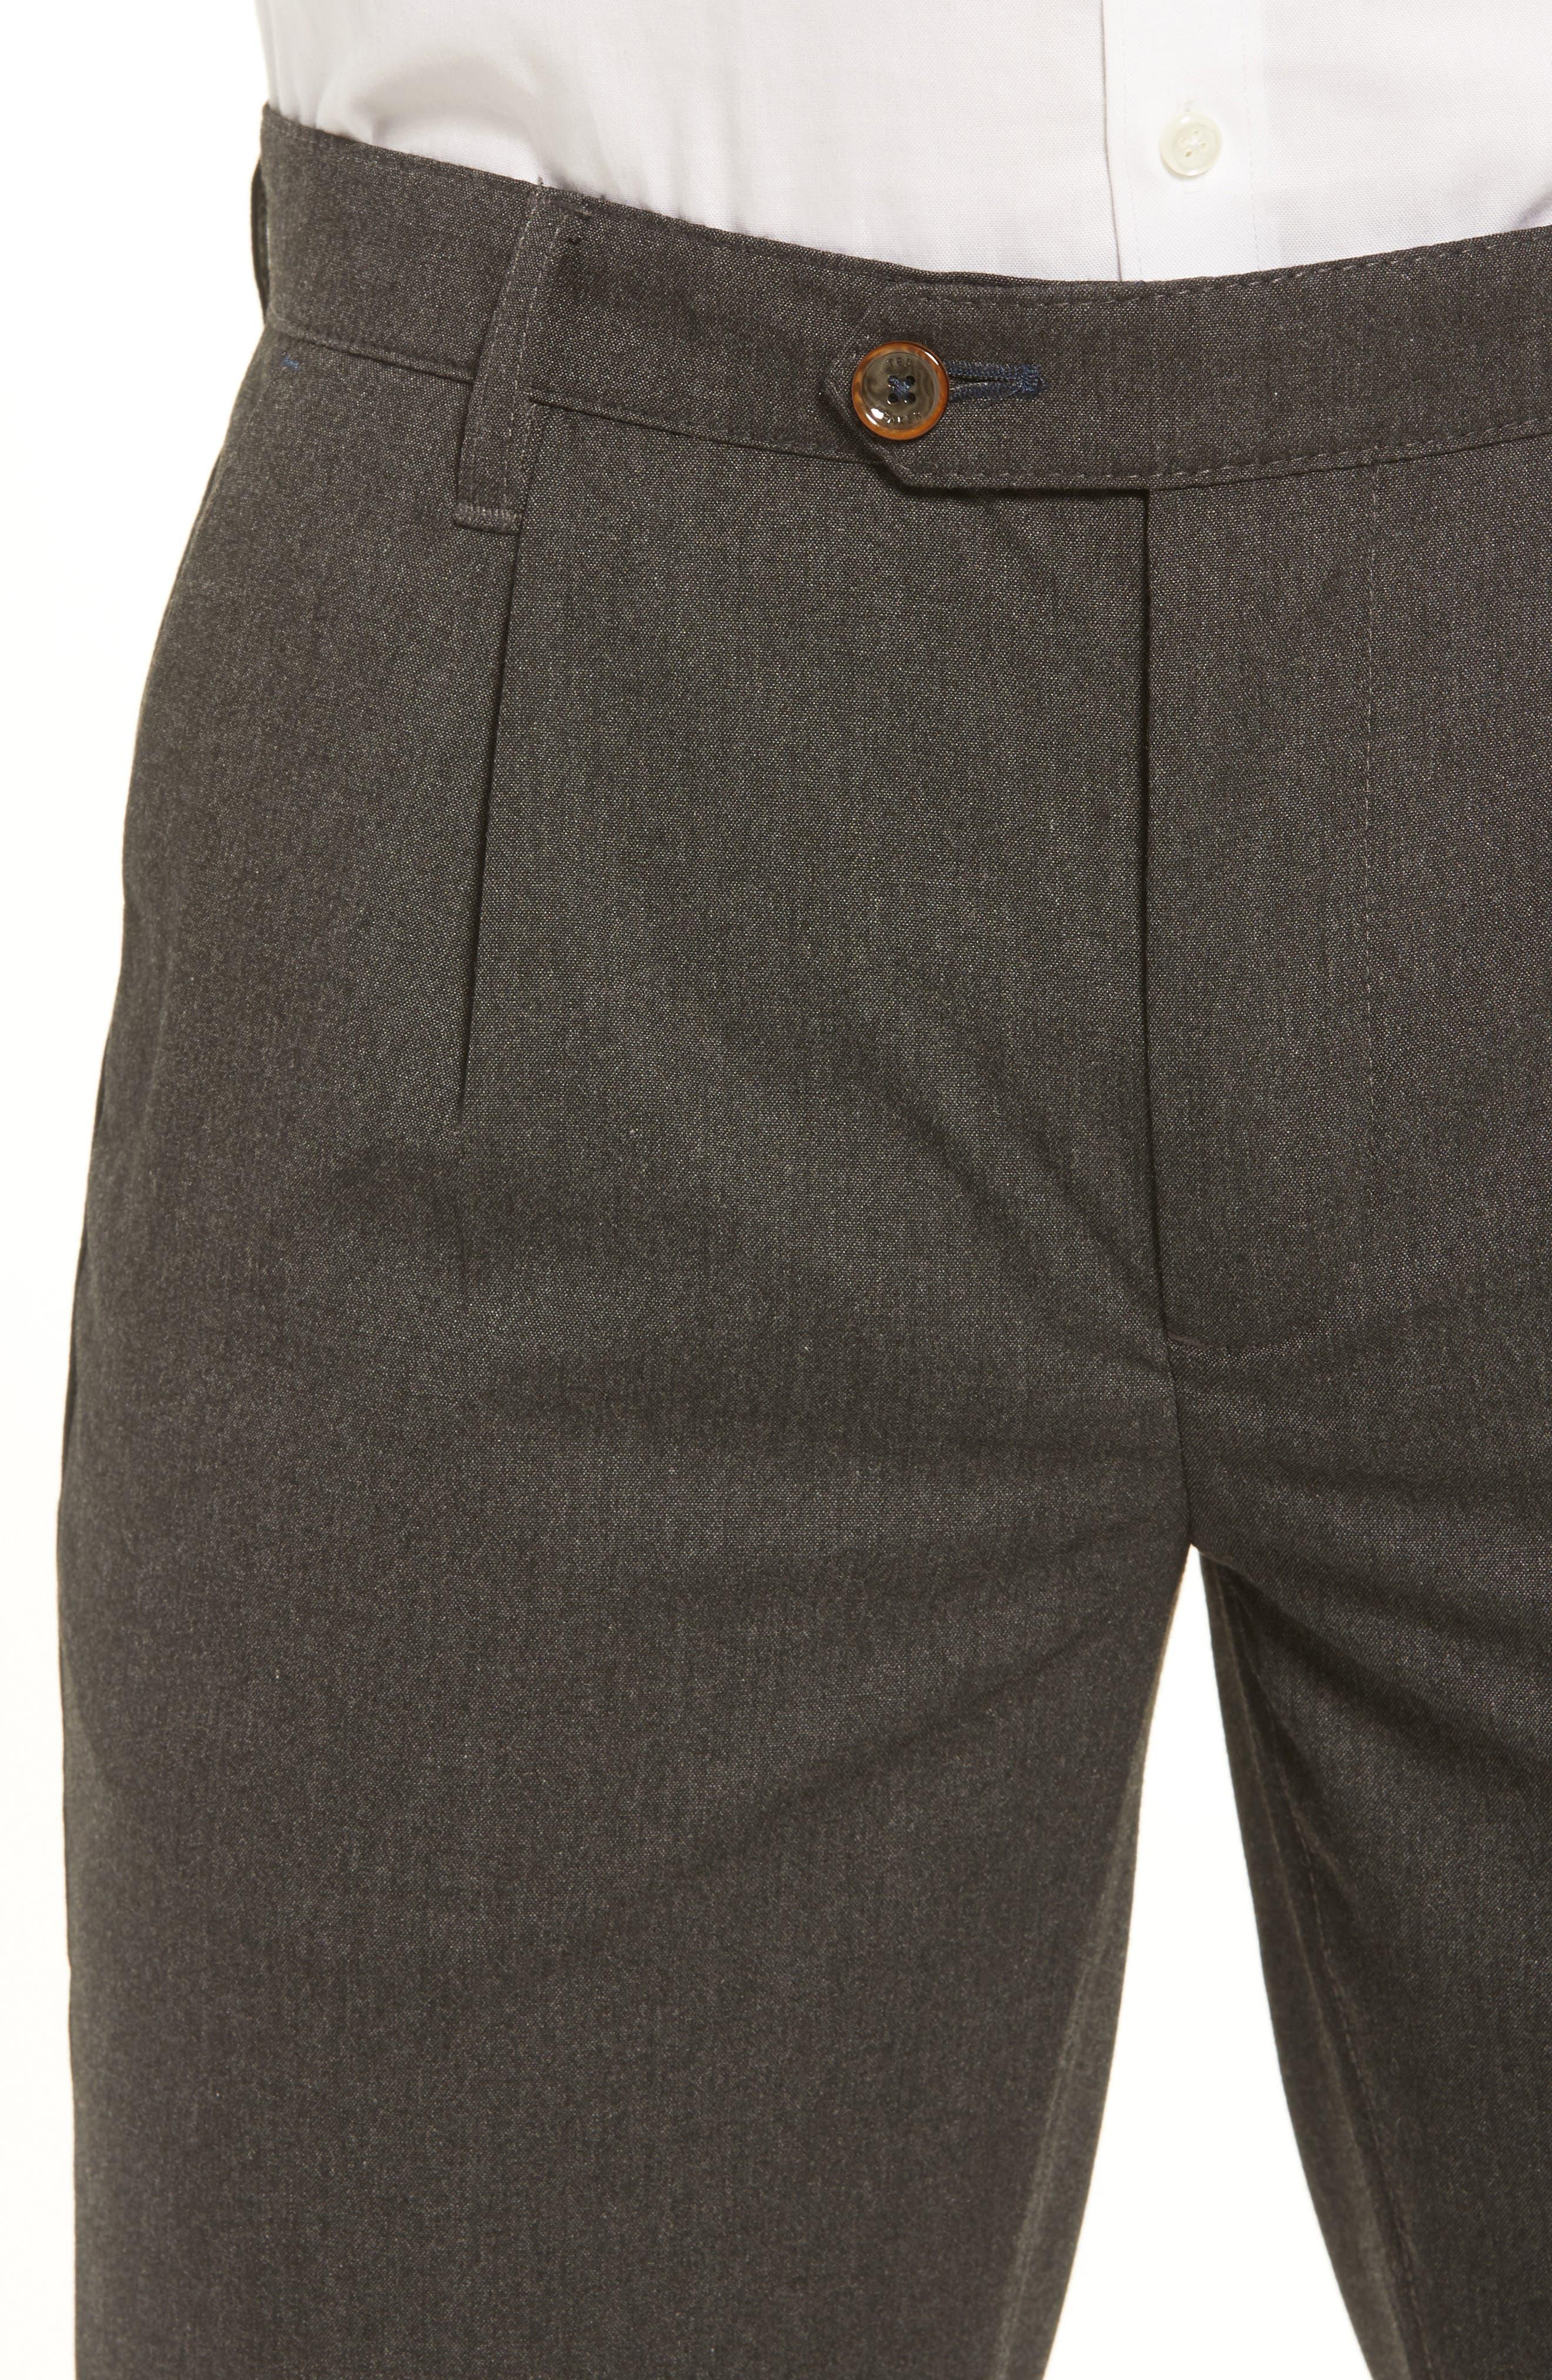 Champi Pleated Cropped Pants,                             Alternate thumbnail 4, color,                             Black